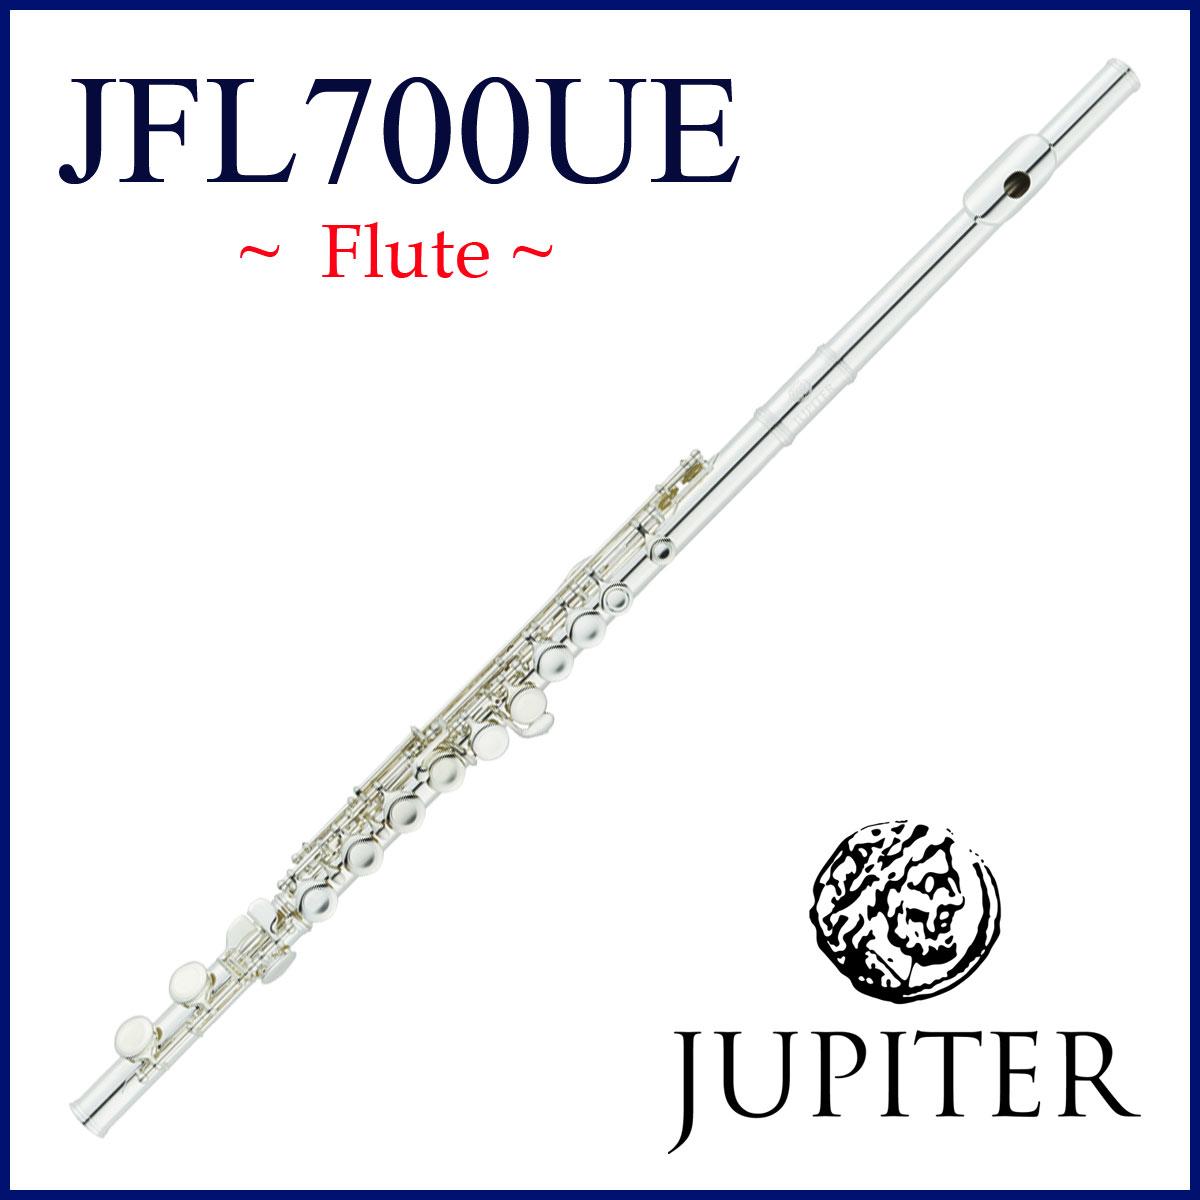 JUPITER / JFL-700UE ジュピターフルート Eメカニズム付 U字頭部管付き 洋白銀メッキ《お取り寄せ》